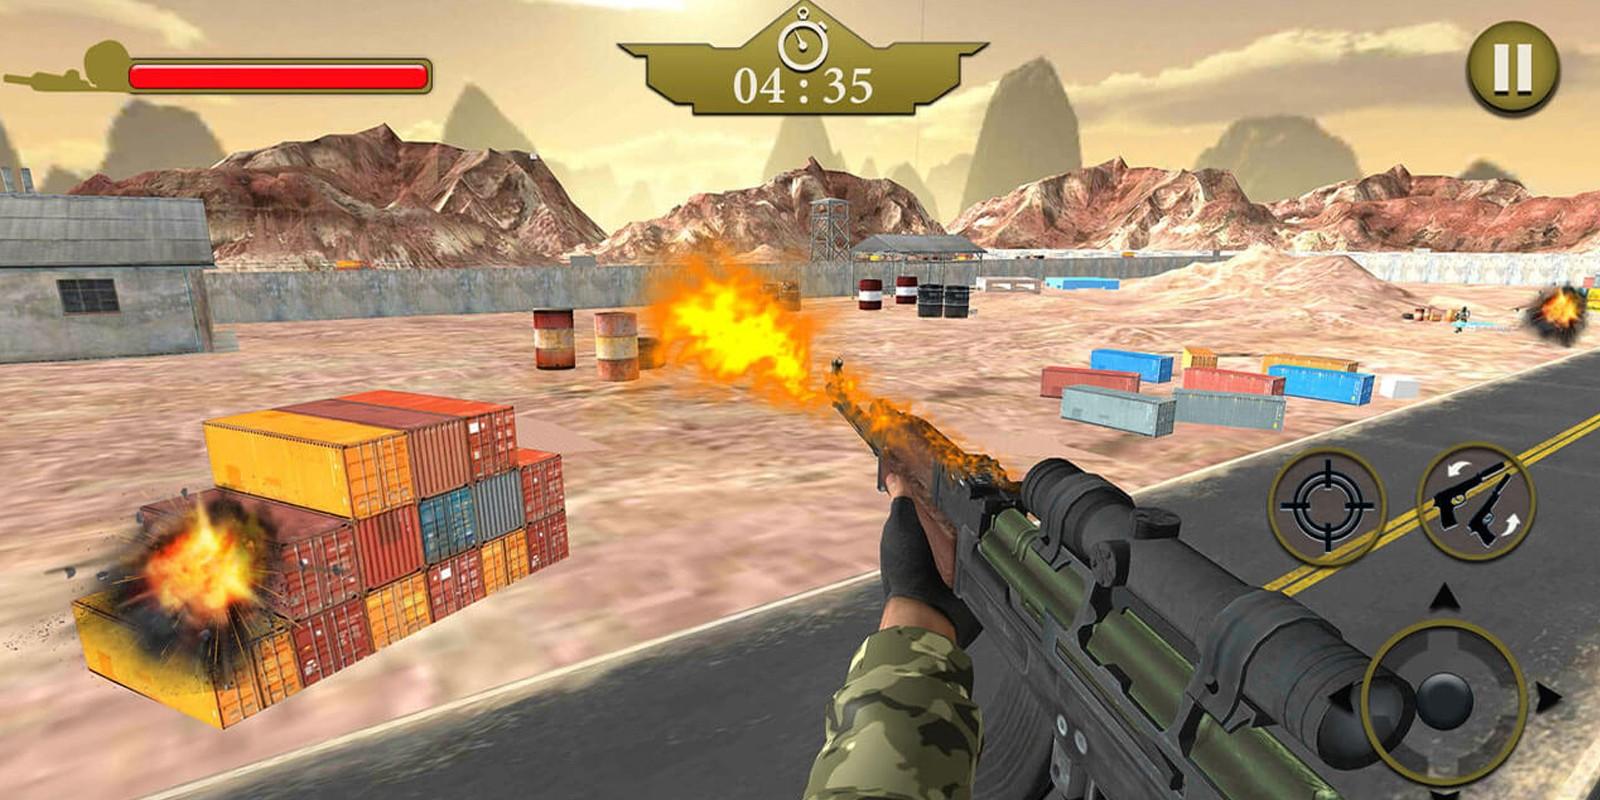 Frontline Army Commando - Unity 3D Game